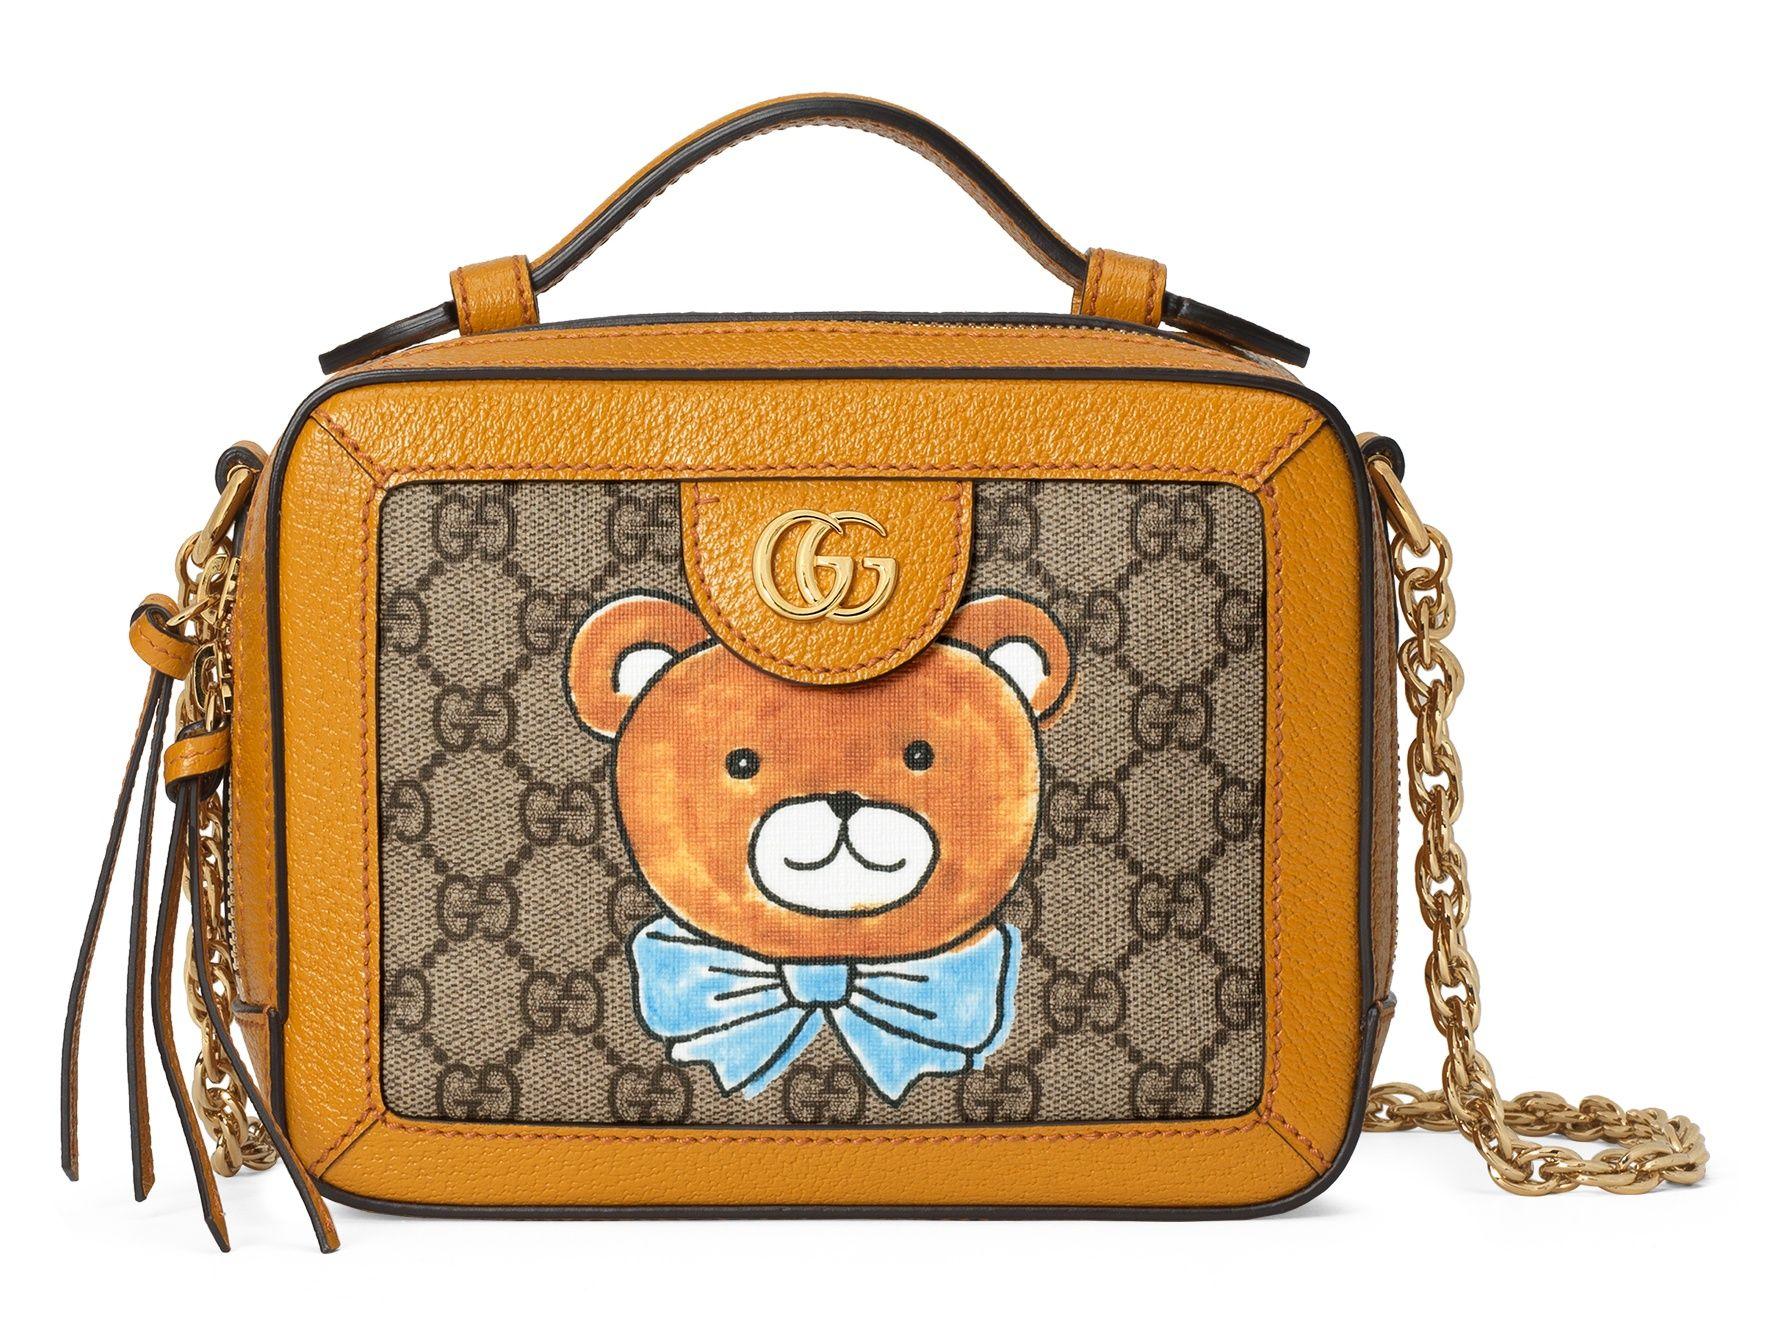 KAI x Gucci 聯名系列 方形肩背包,建議售價 NT$71,800